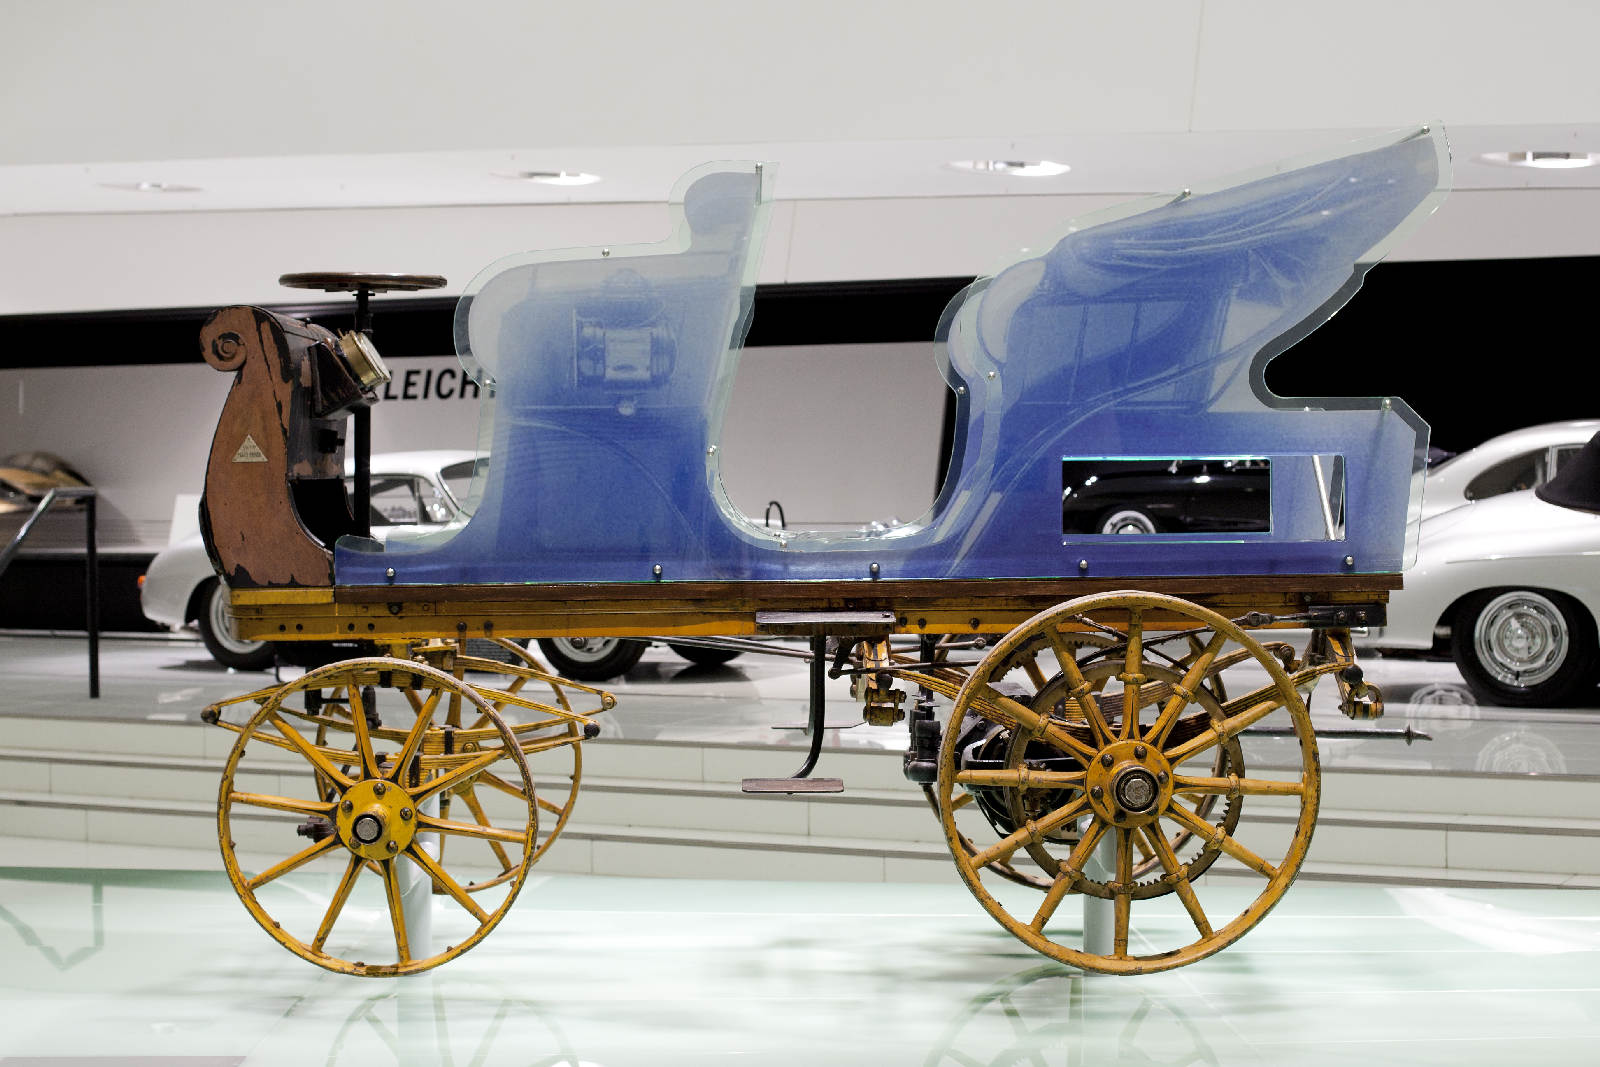 Porsche P1 Egger-Lohner electric vehicle, C.2 Phaeton model 1